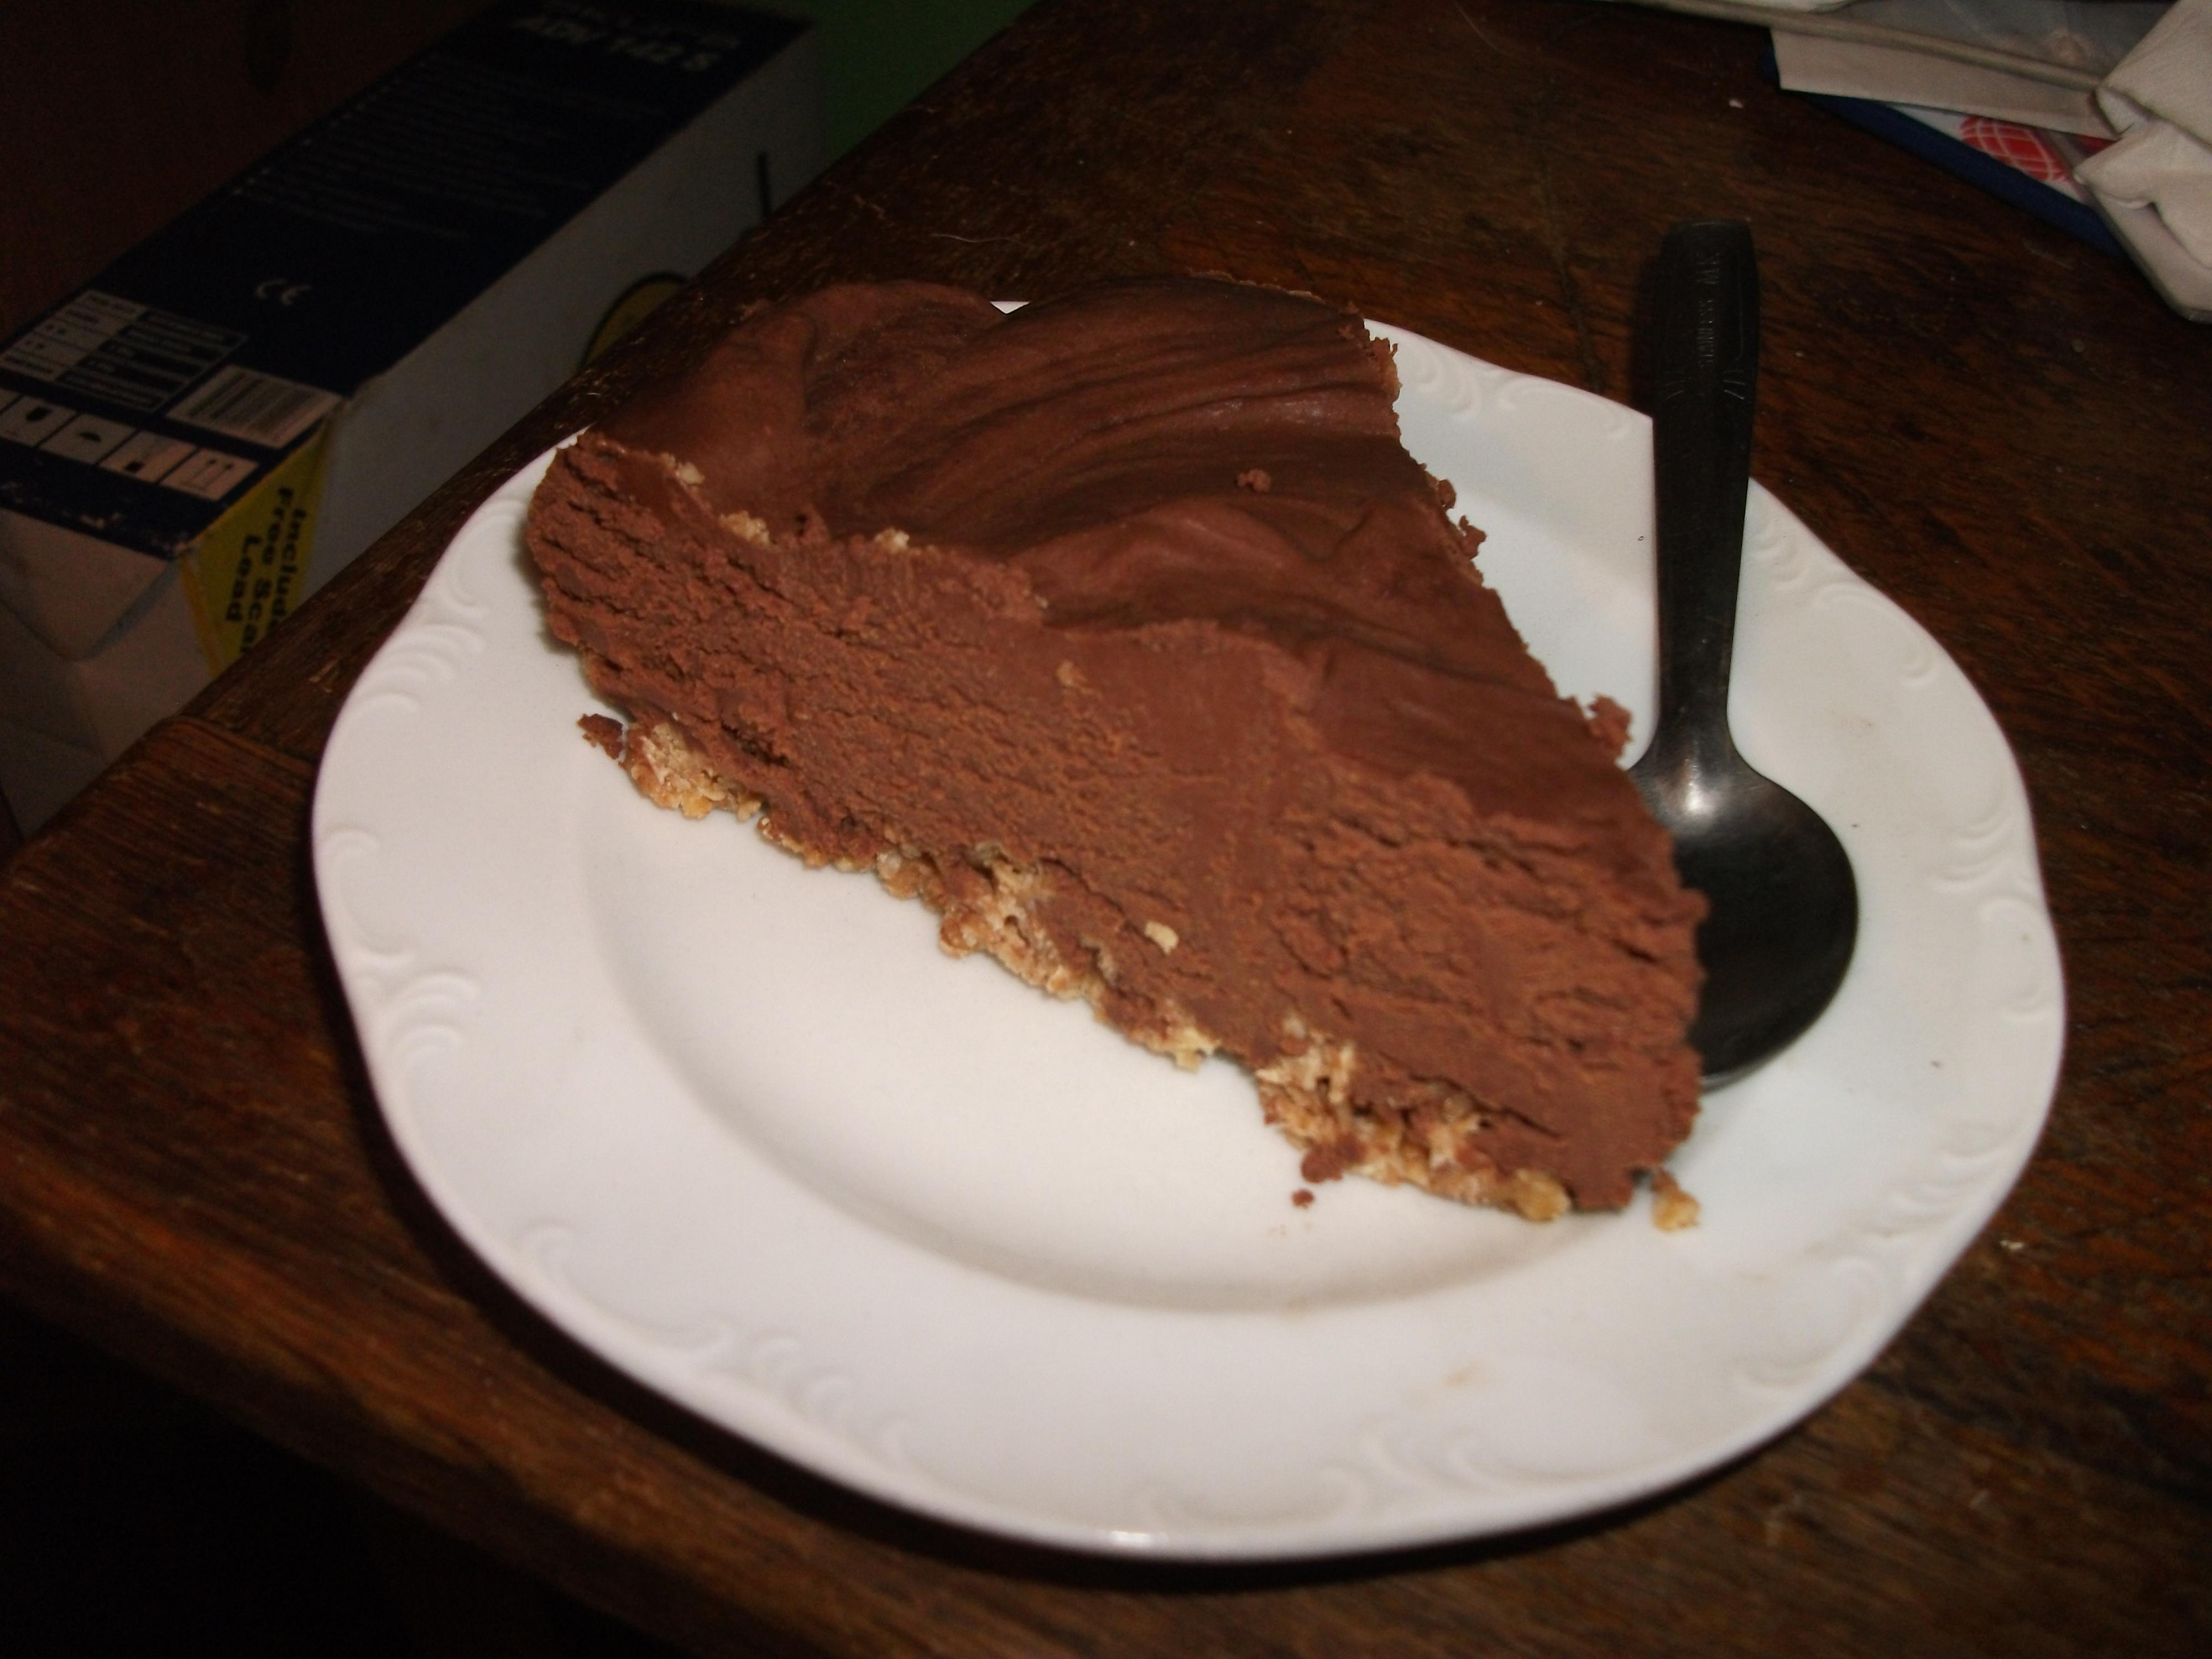 Chocolate and orange cheese cake - 27th November 2010